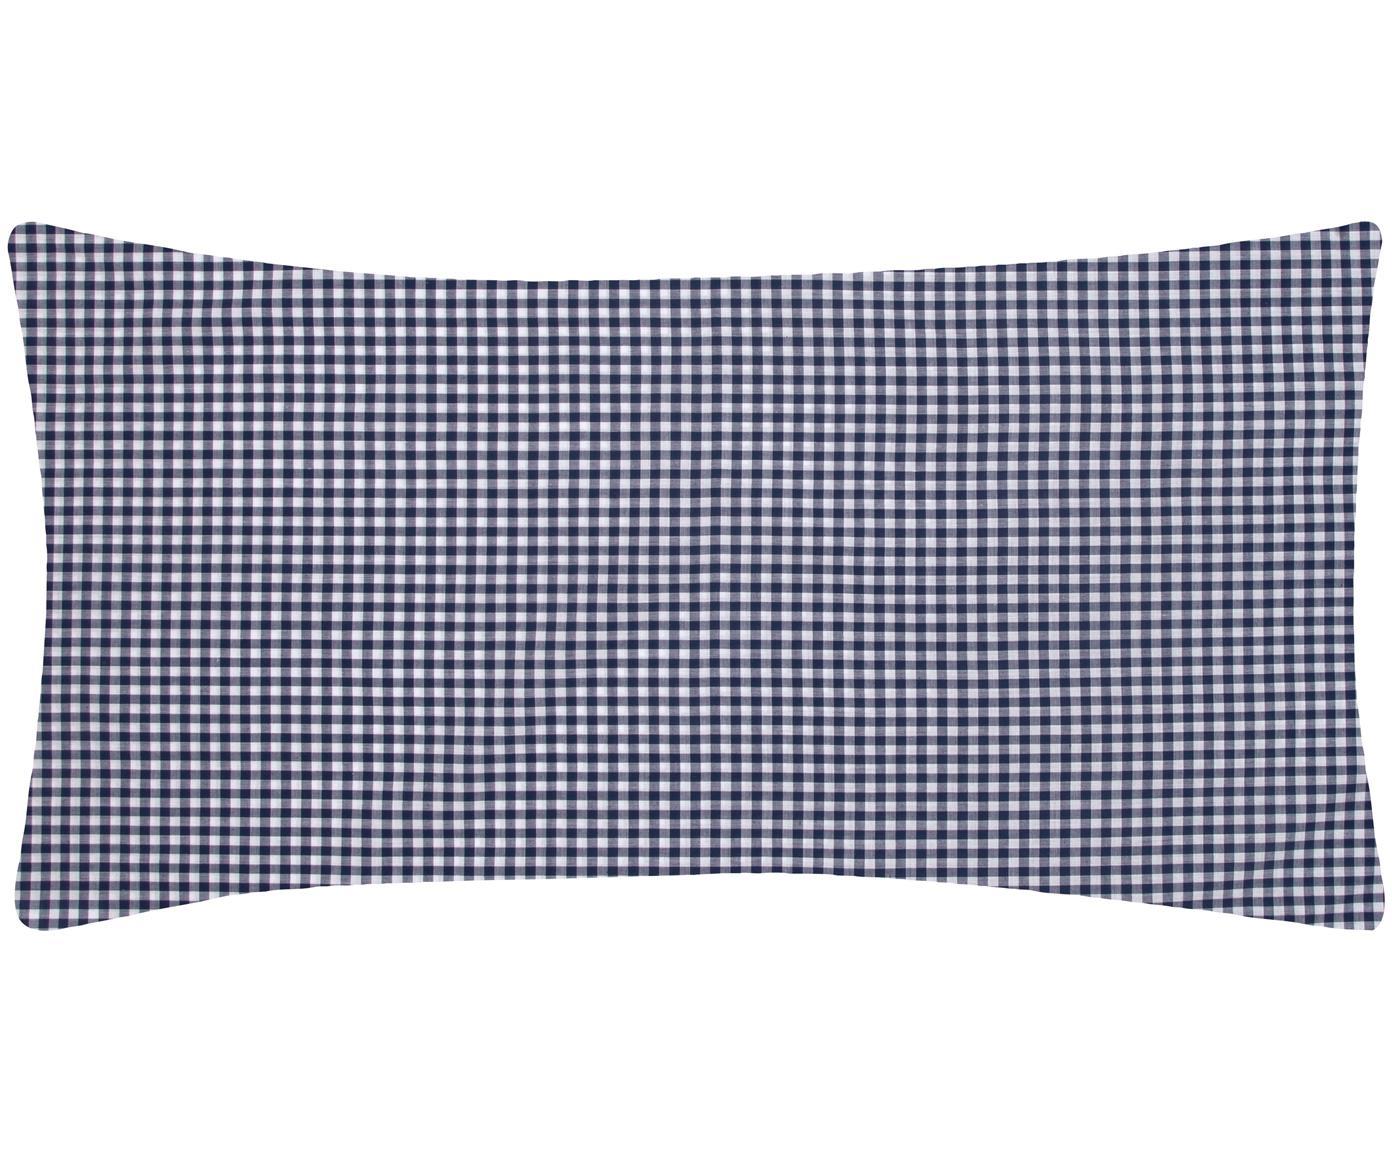 Funda de almohada de algodón Scotty, Algodón, Azul, blanco, An 45 x L 85 cm